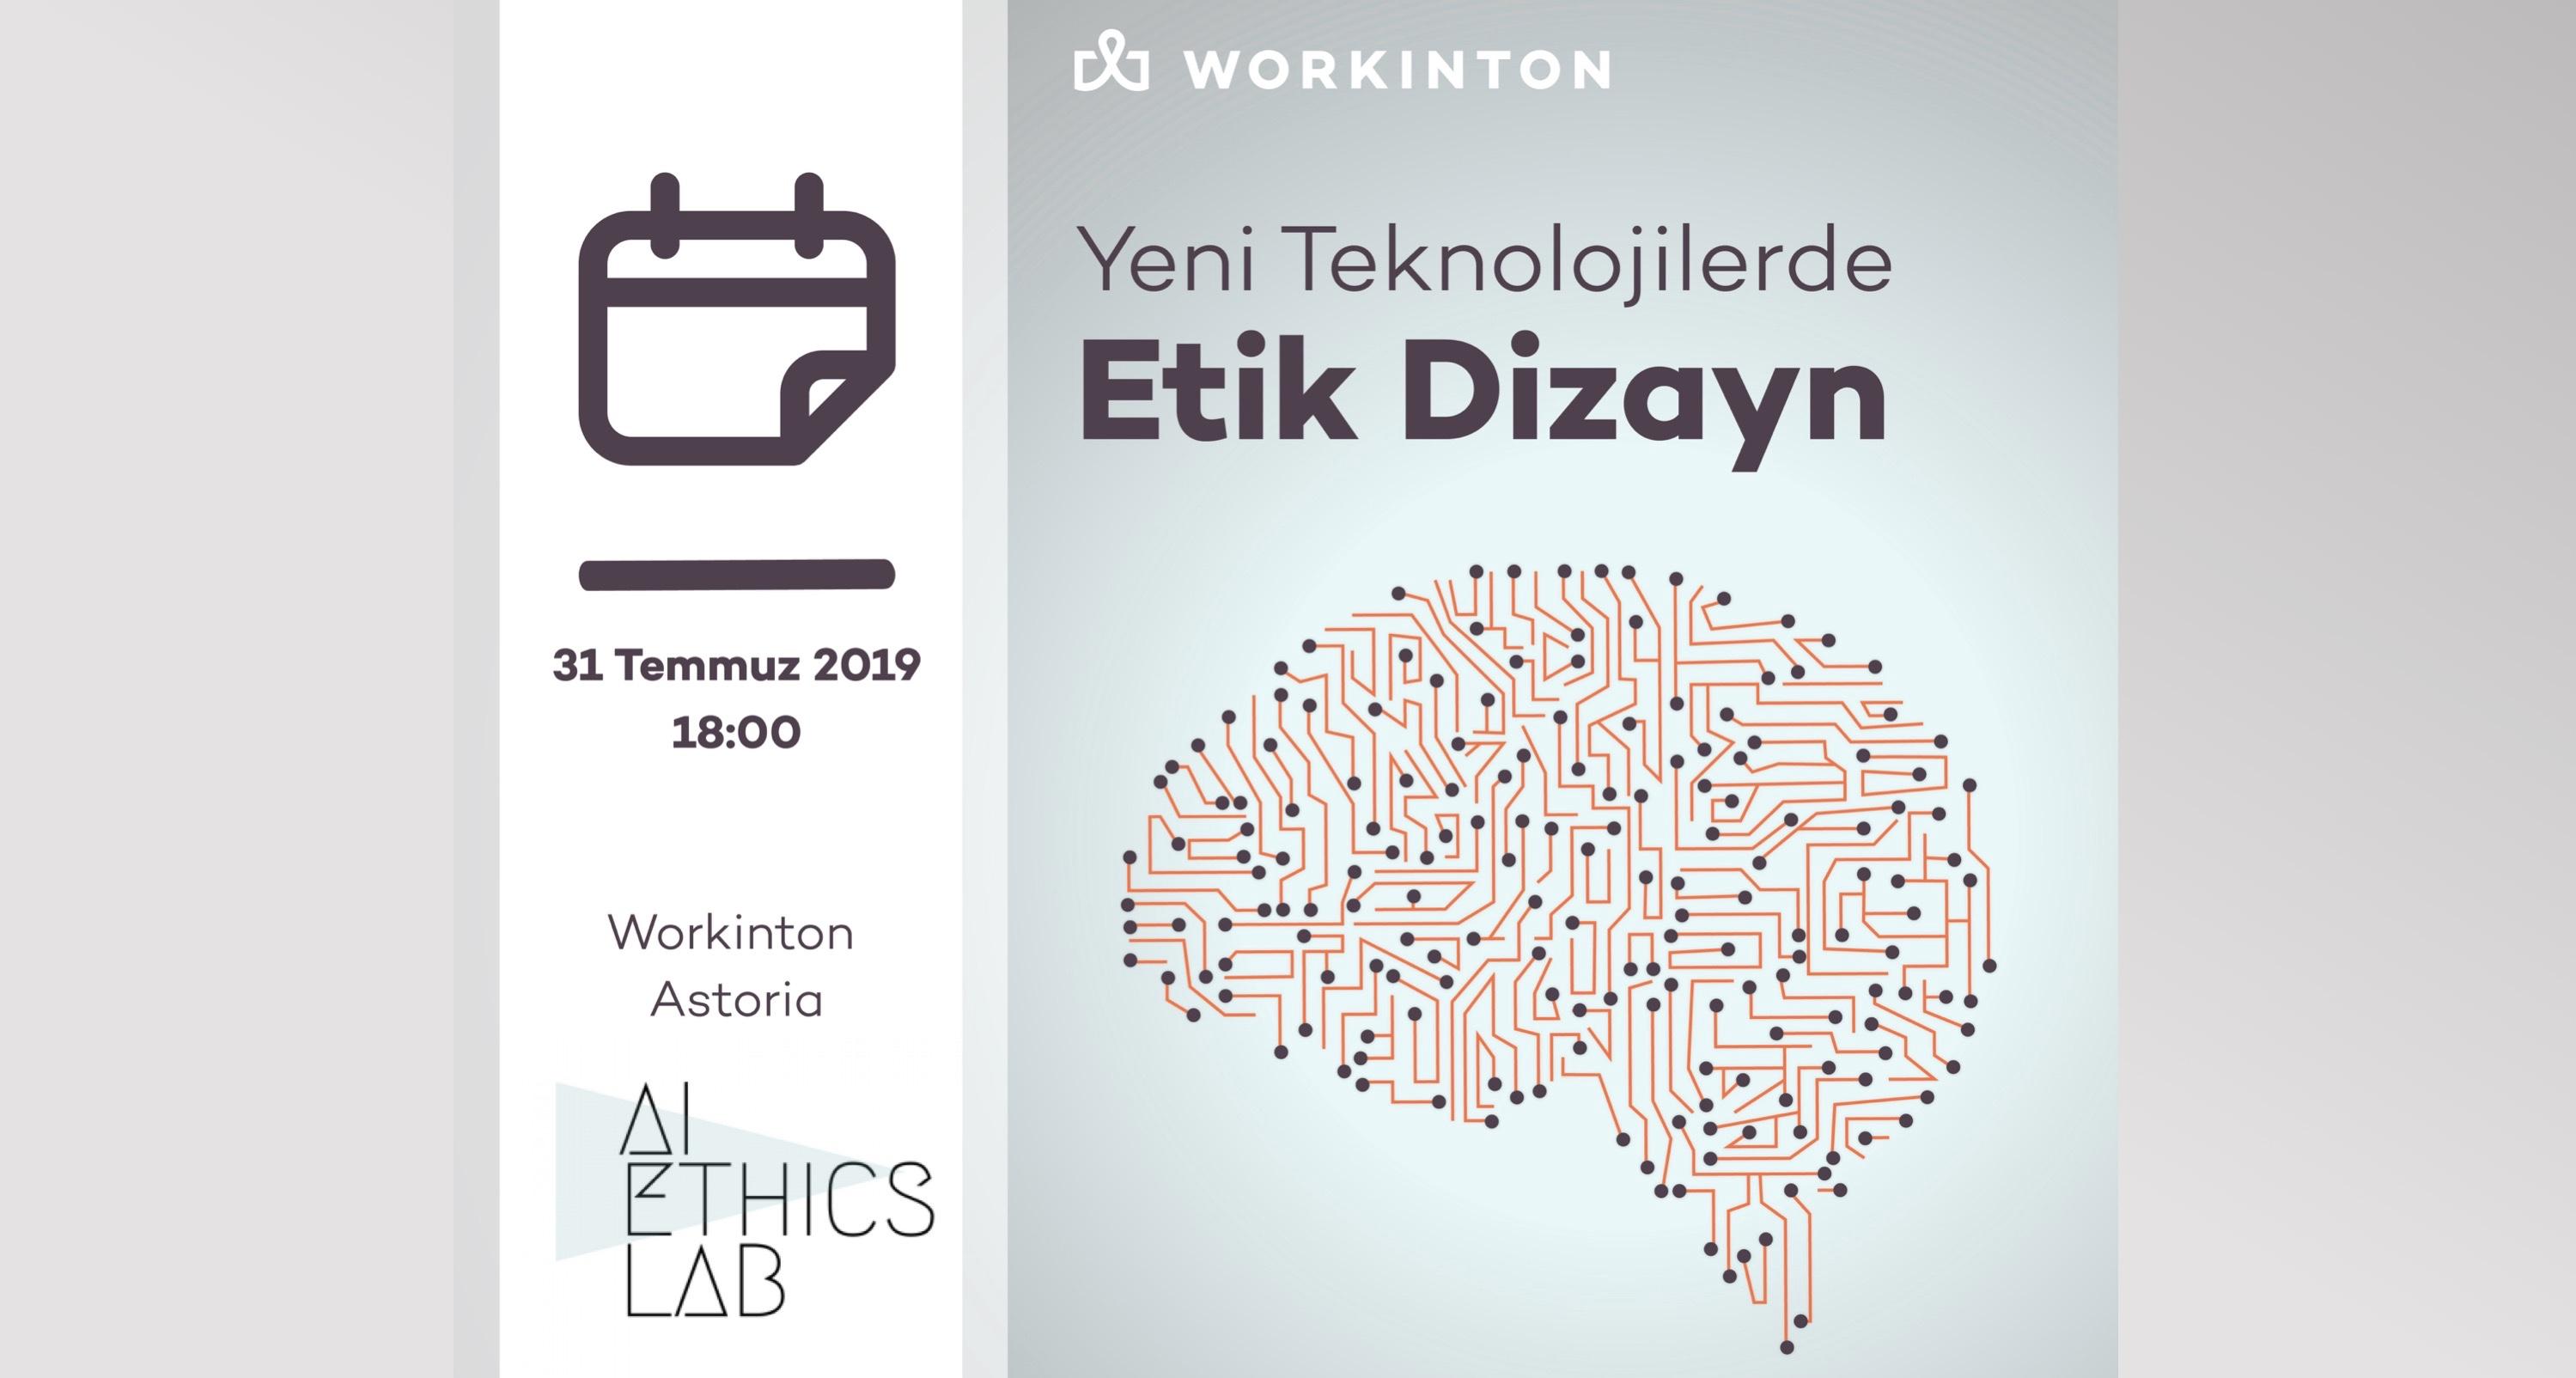 Workinton + AI Ethics Lab Collaboration – 31.7.2019